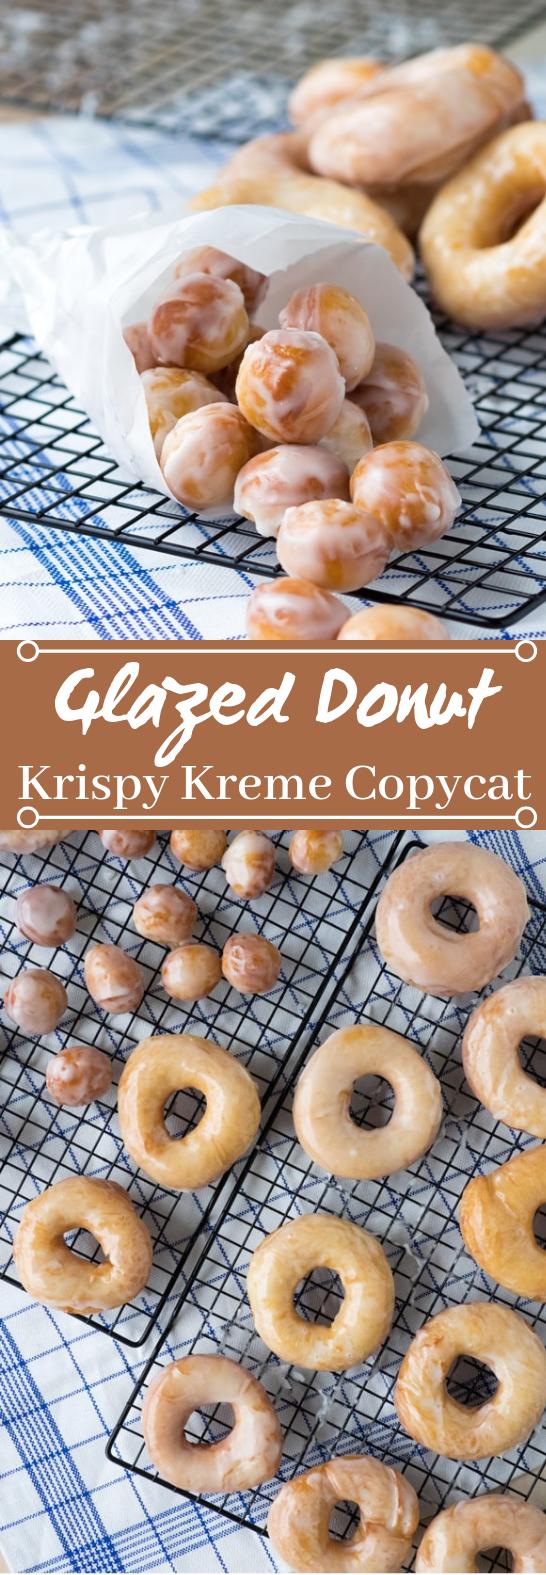 Original Glazed Donuts (Krispy Kreme Recipe Copycat) #desserts #baking